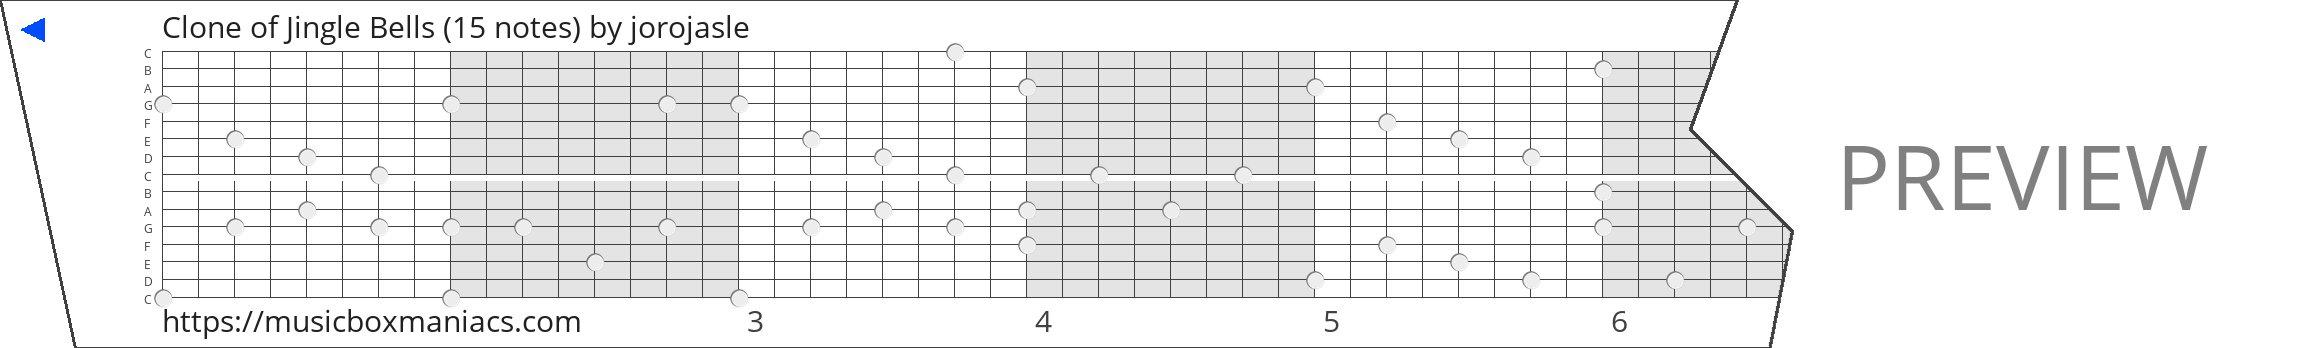 Clone of Jingle Bells (15 notes) 15 note music box paper strip